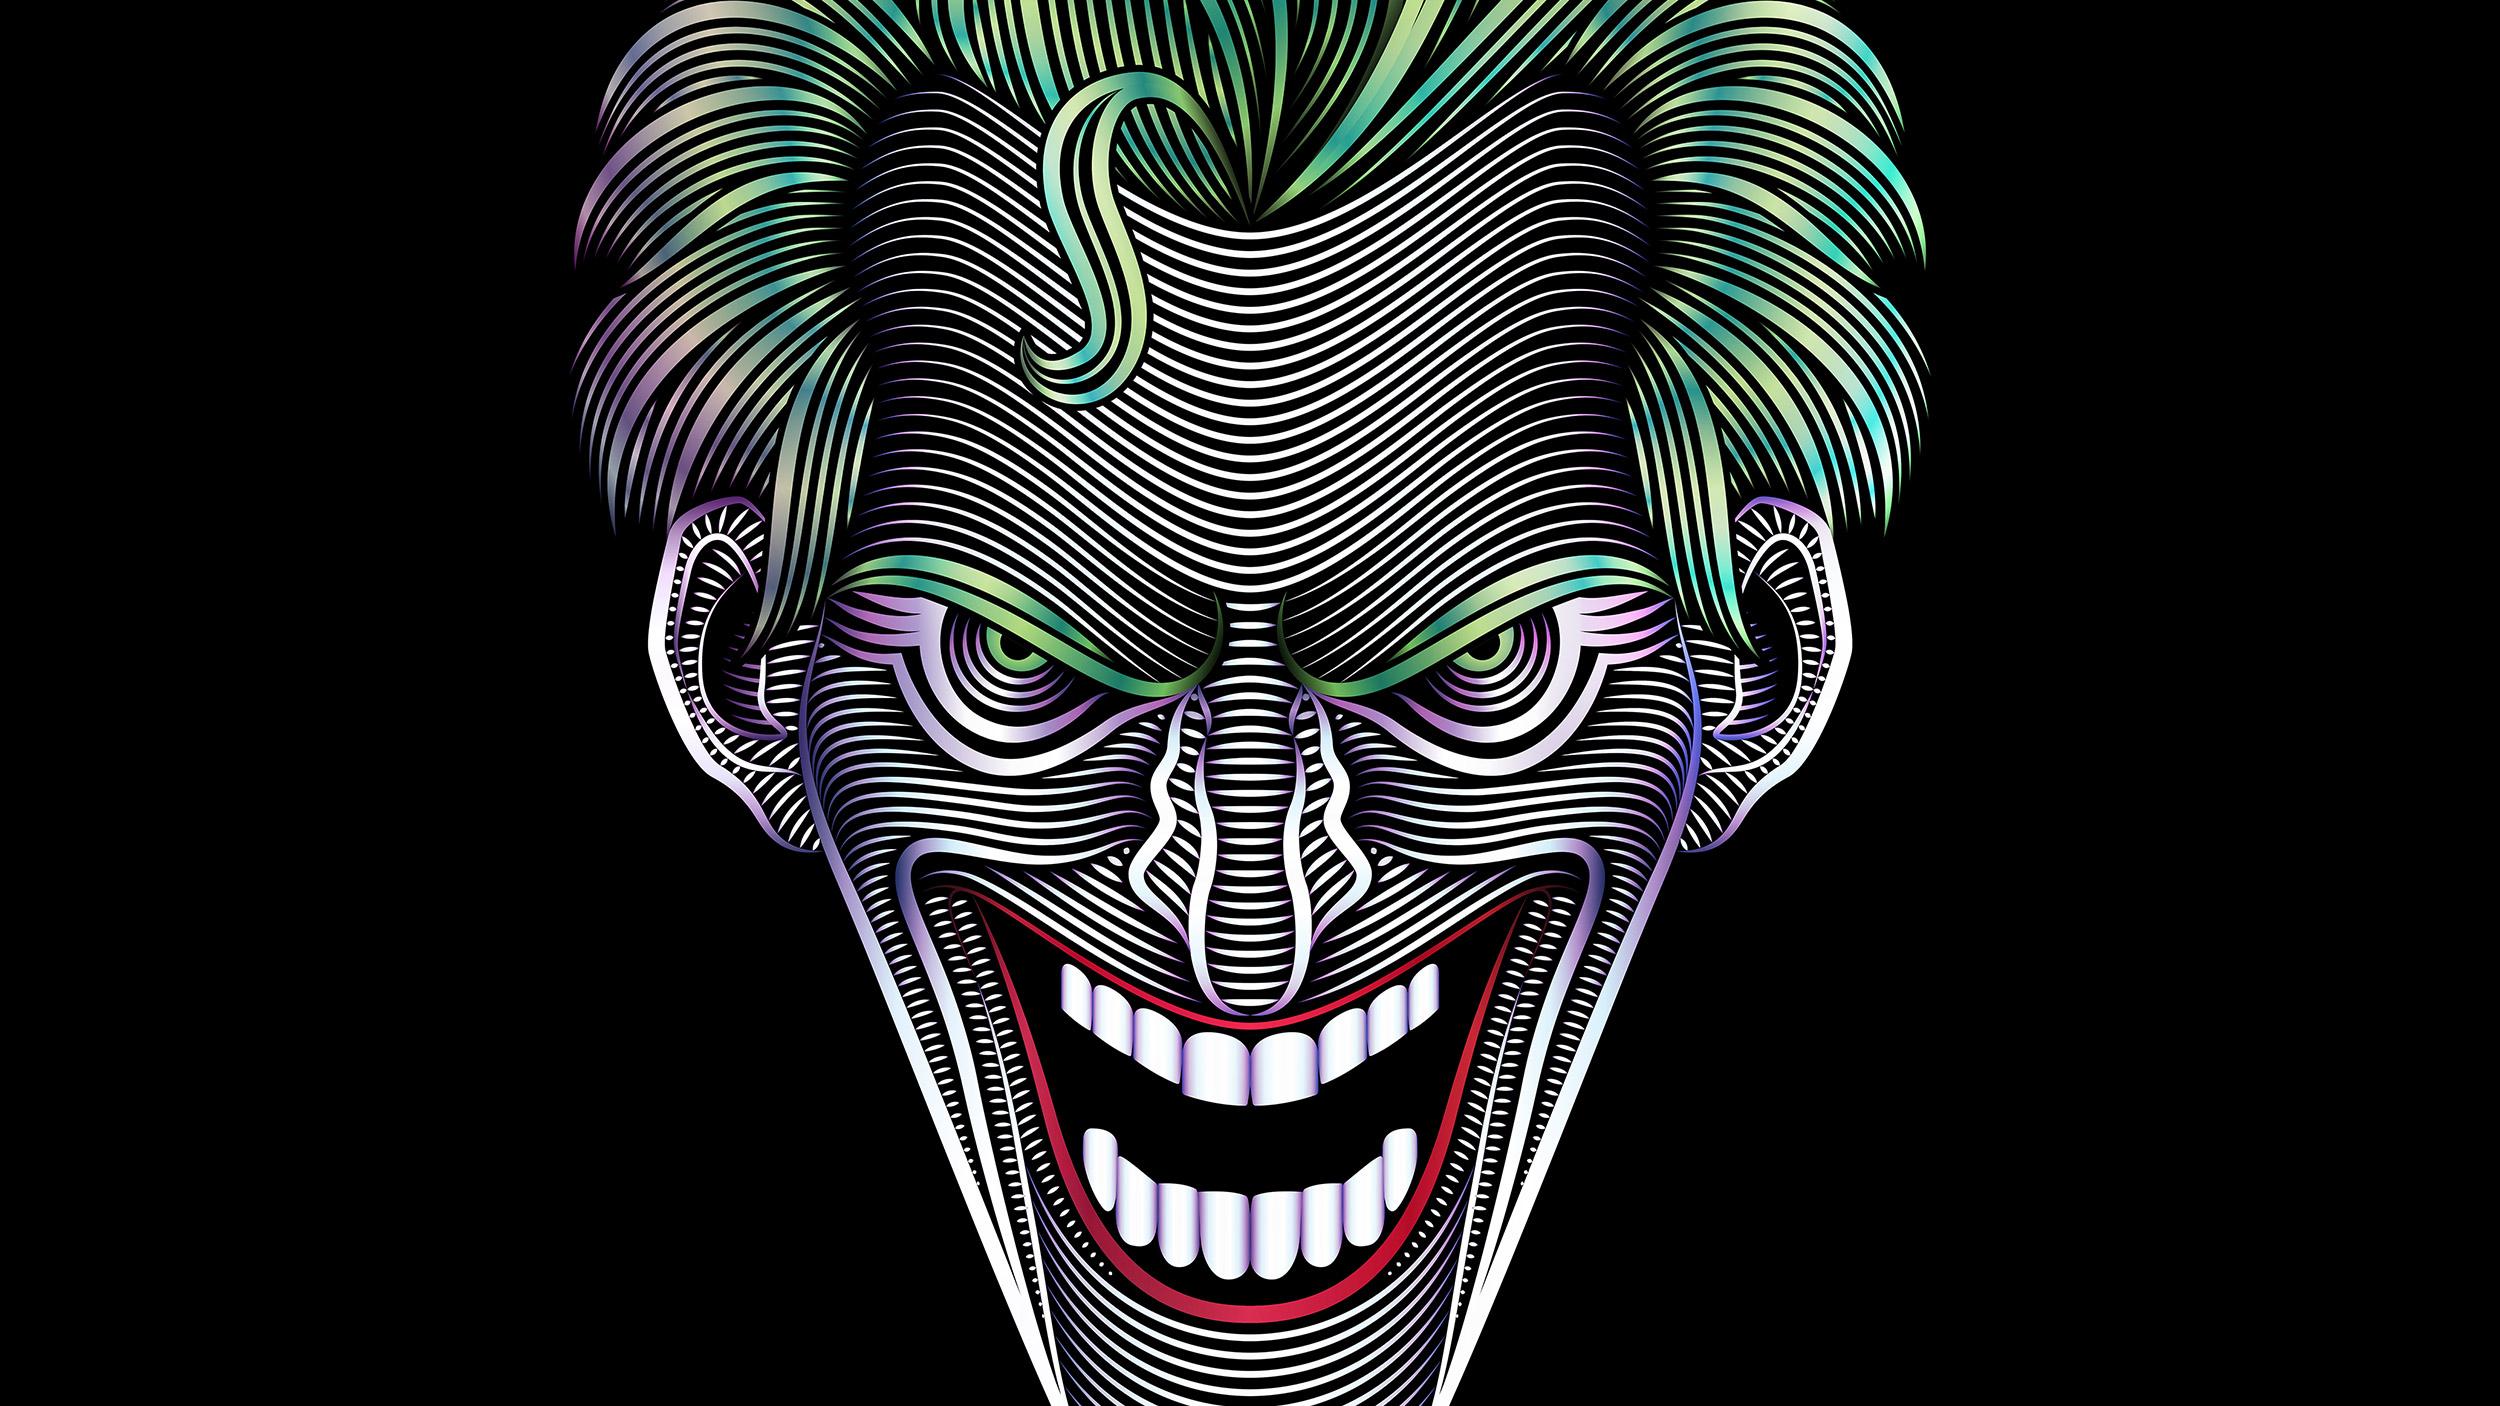 Six Flags Joker Illustration Gradients